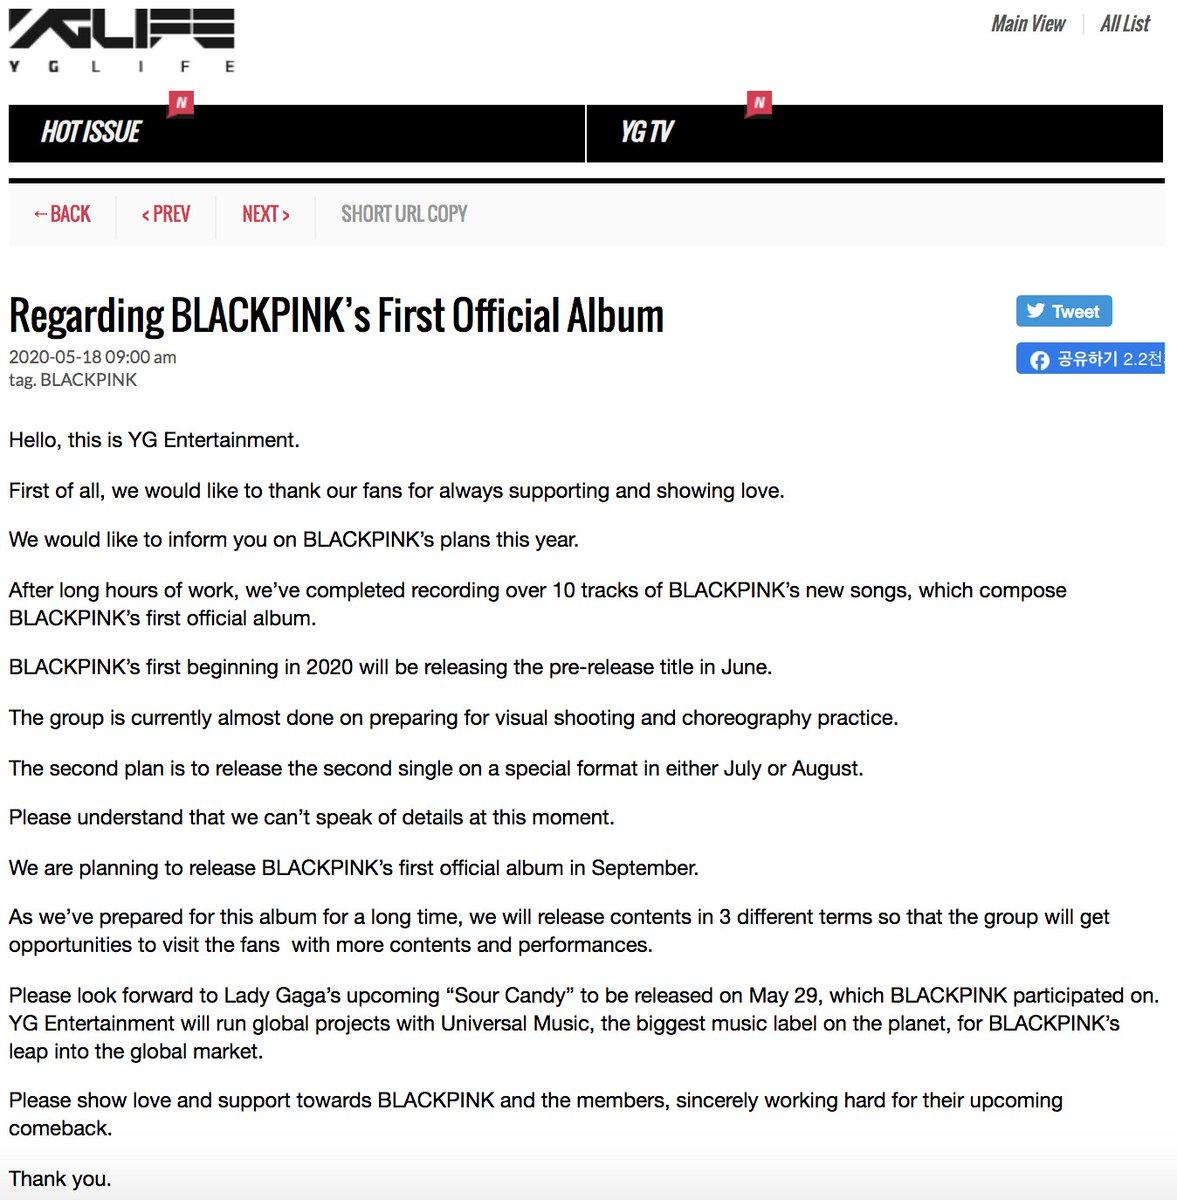 #BLACKPINK 정규 앨범에 대하여  #블랙핑크 #YGpic.twitter.com/UNOqY8pkj4